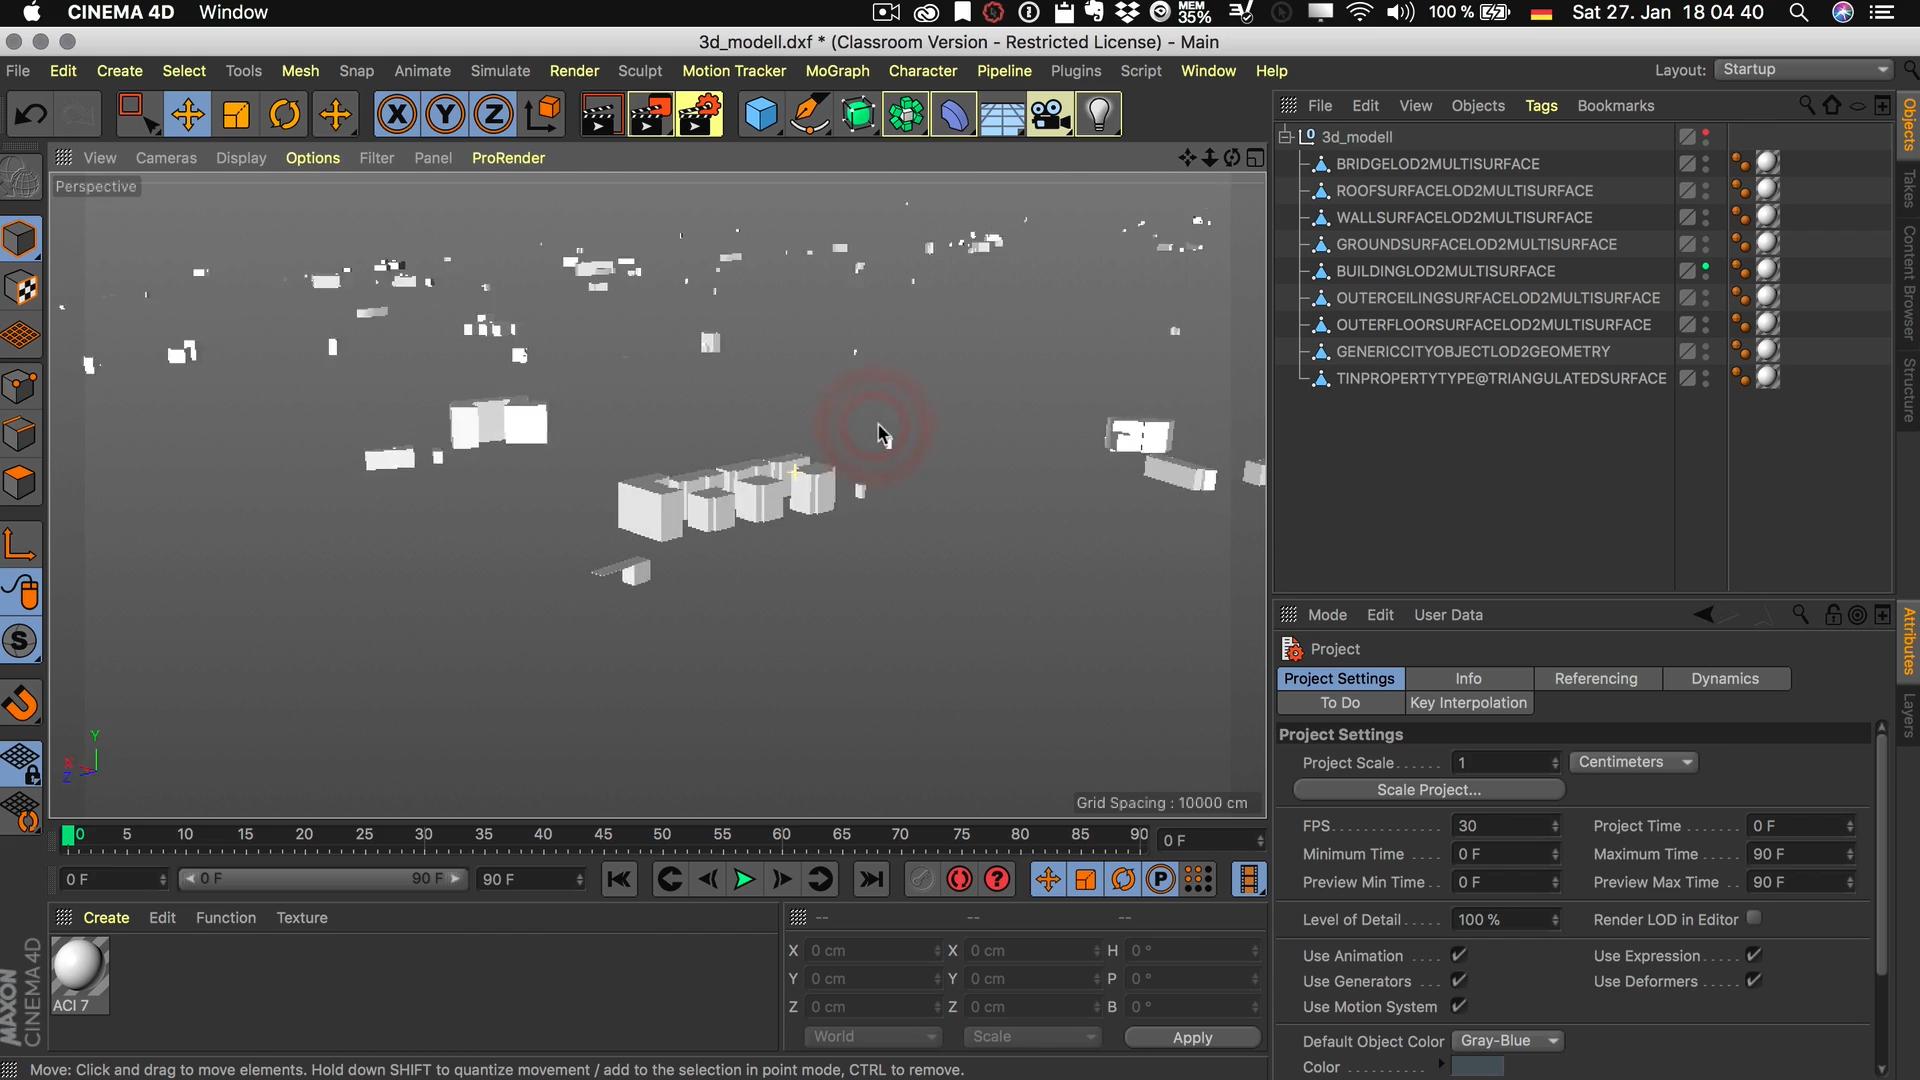 Cinema4D 3D-Stadtmodell Unterobjekt aus DXF Ebene Layer sinnlos